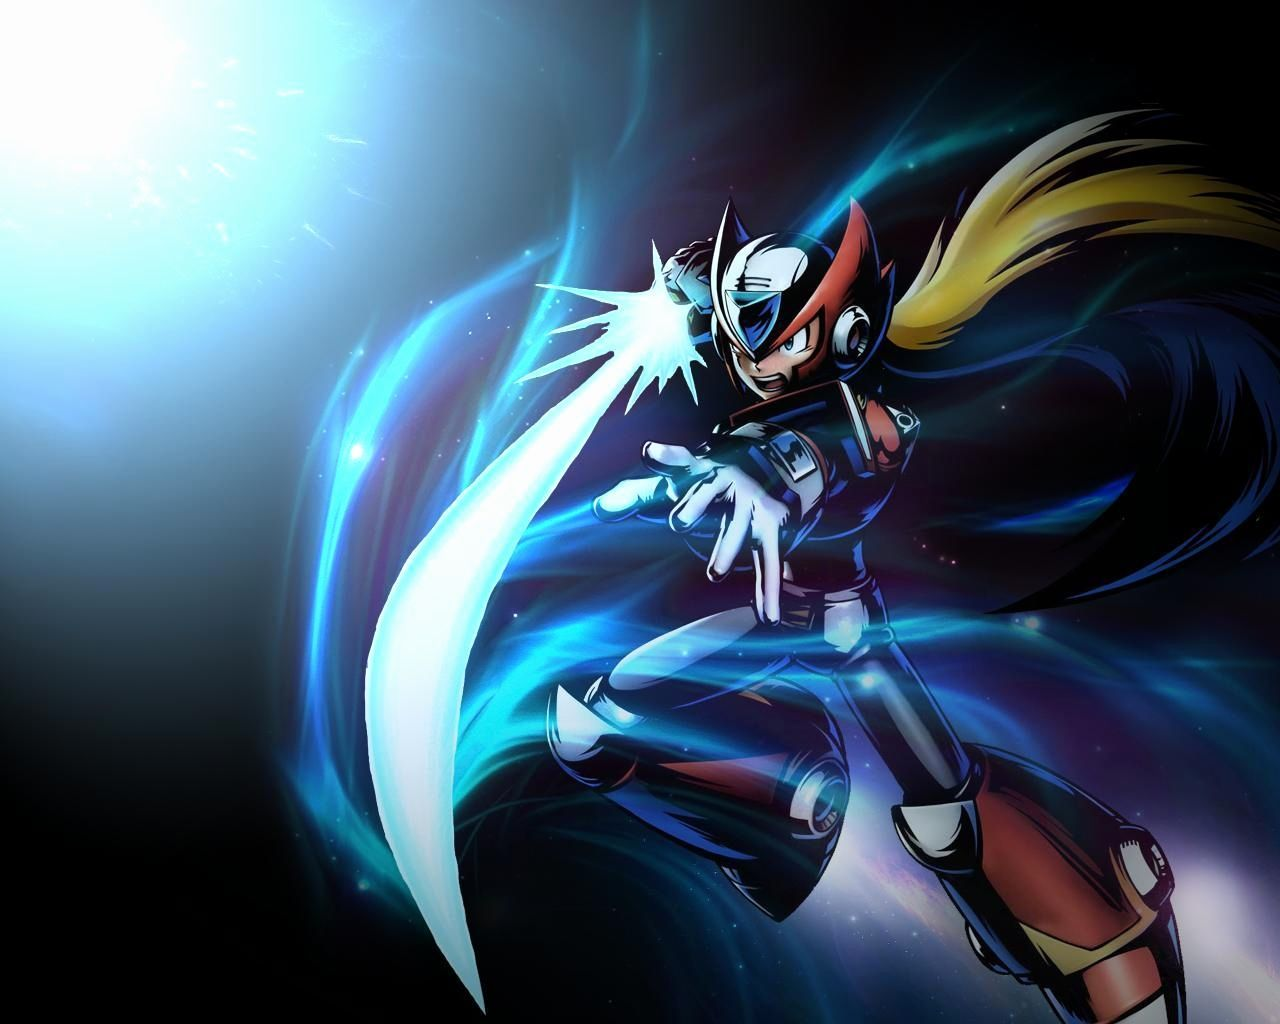 Mega Man X Wallpapers Top Free Mega Man X Backgrounds Wallpaperaccess